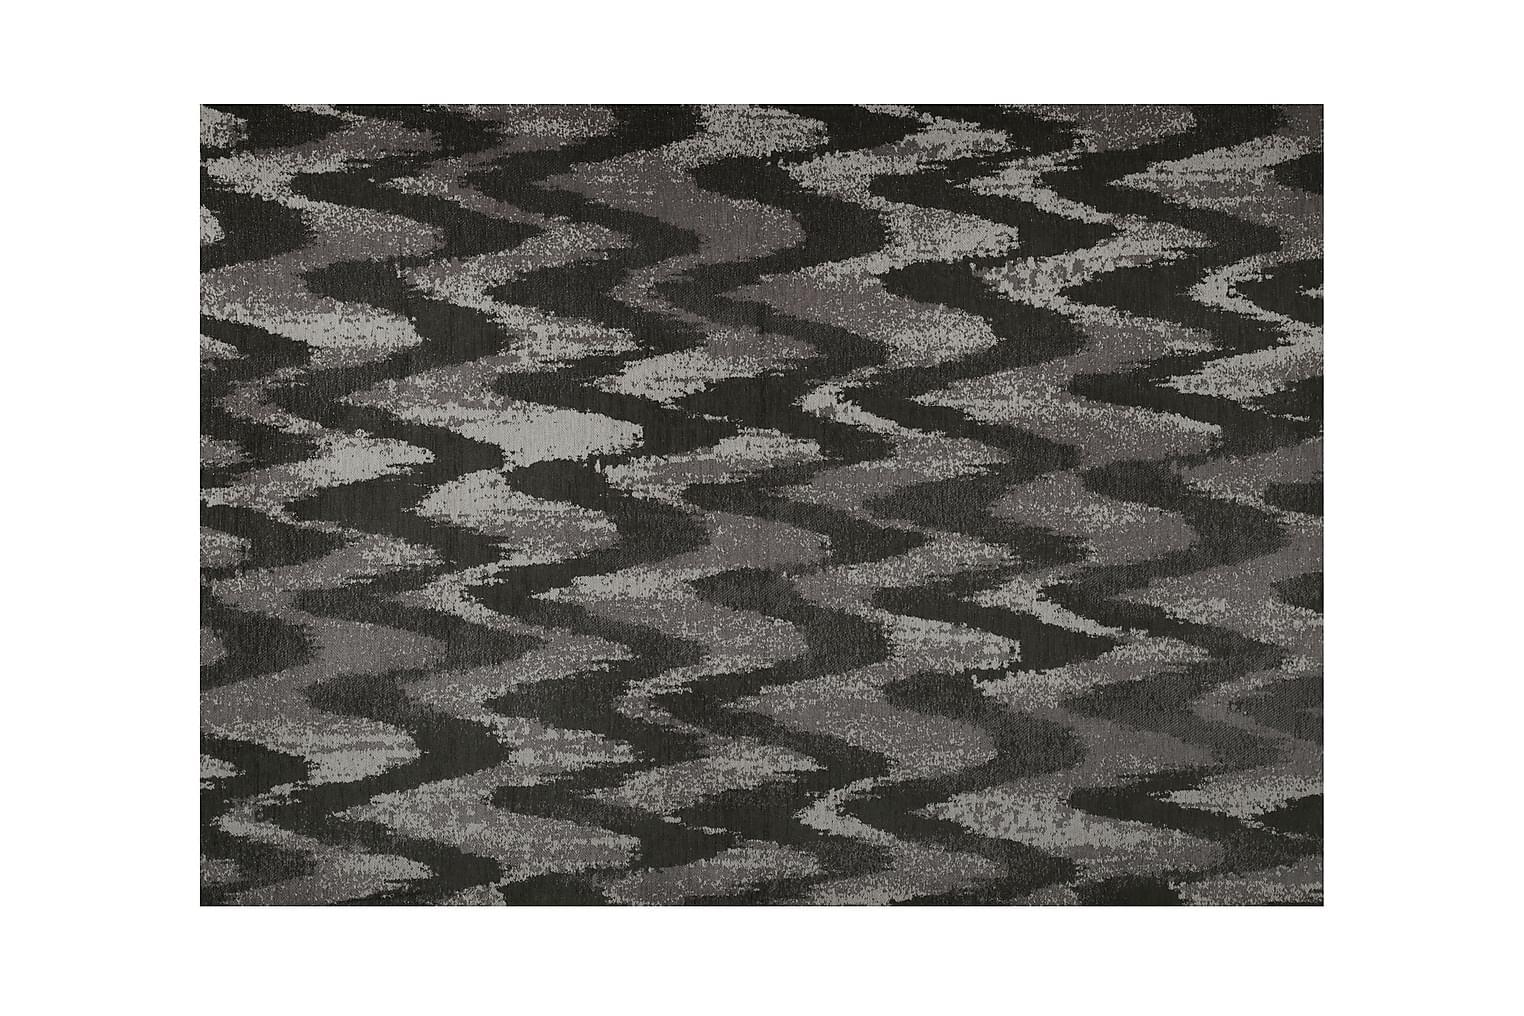 LUCERNE Matto 160x230 Harmaa/Kuviollinen